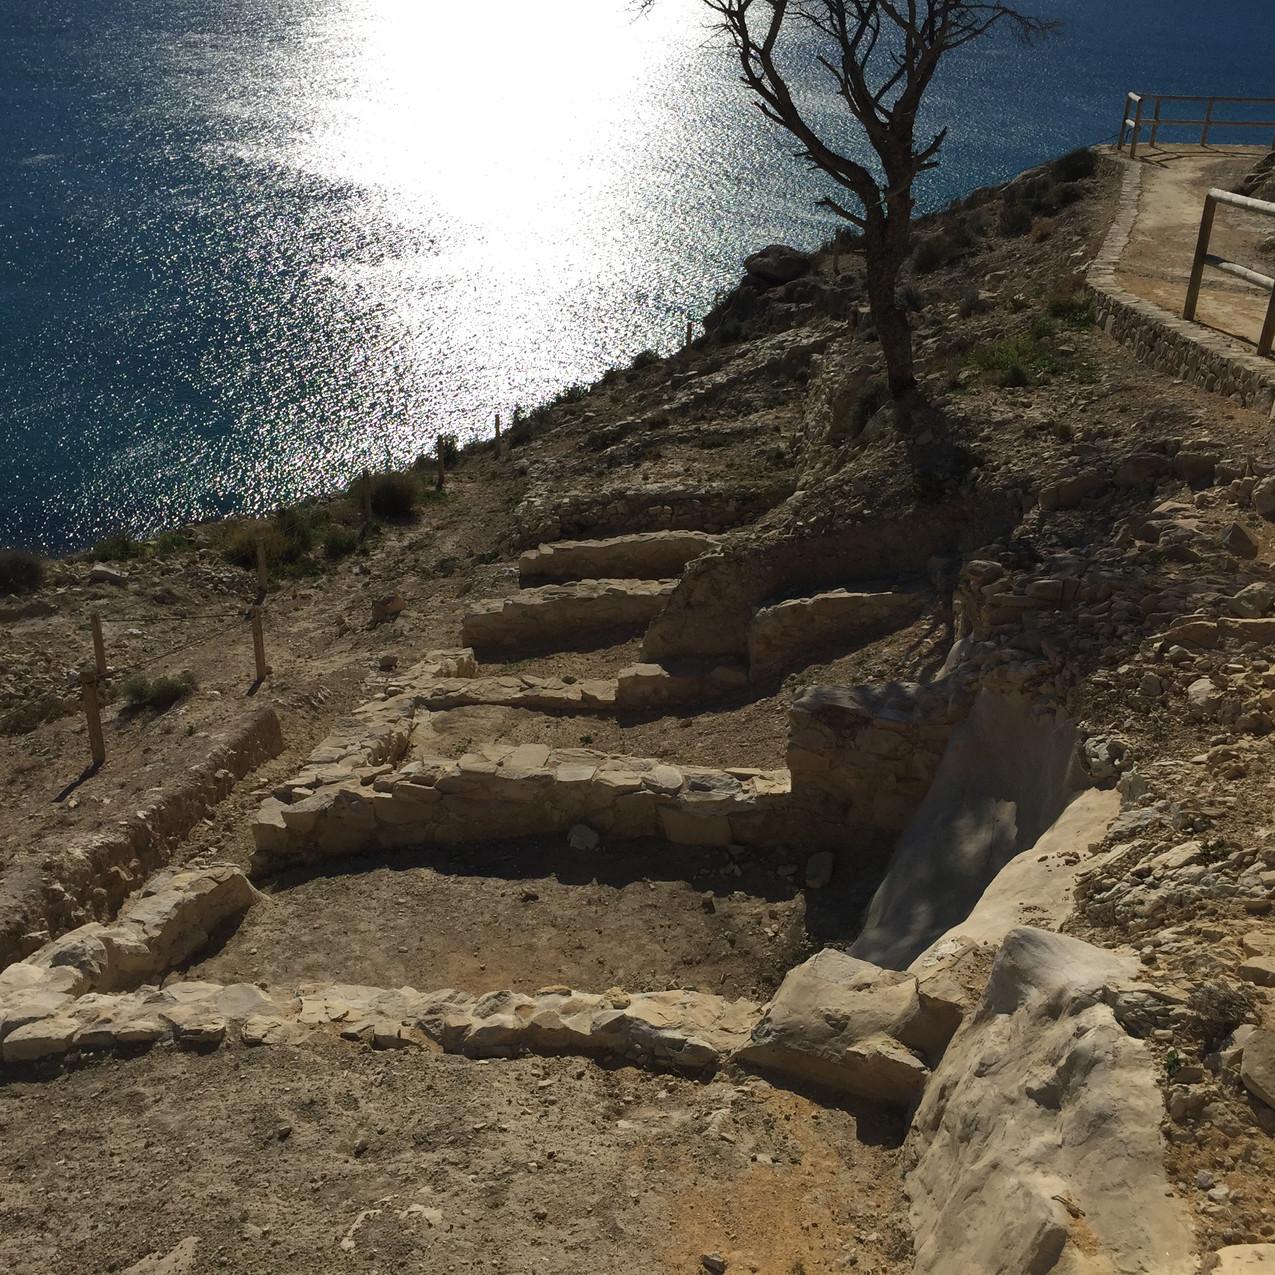 Shrine remains, Malladeta clifftop